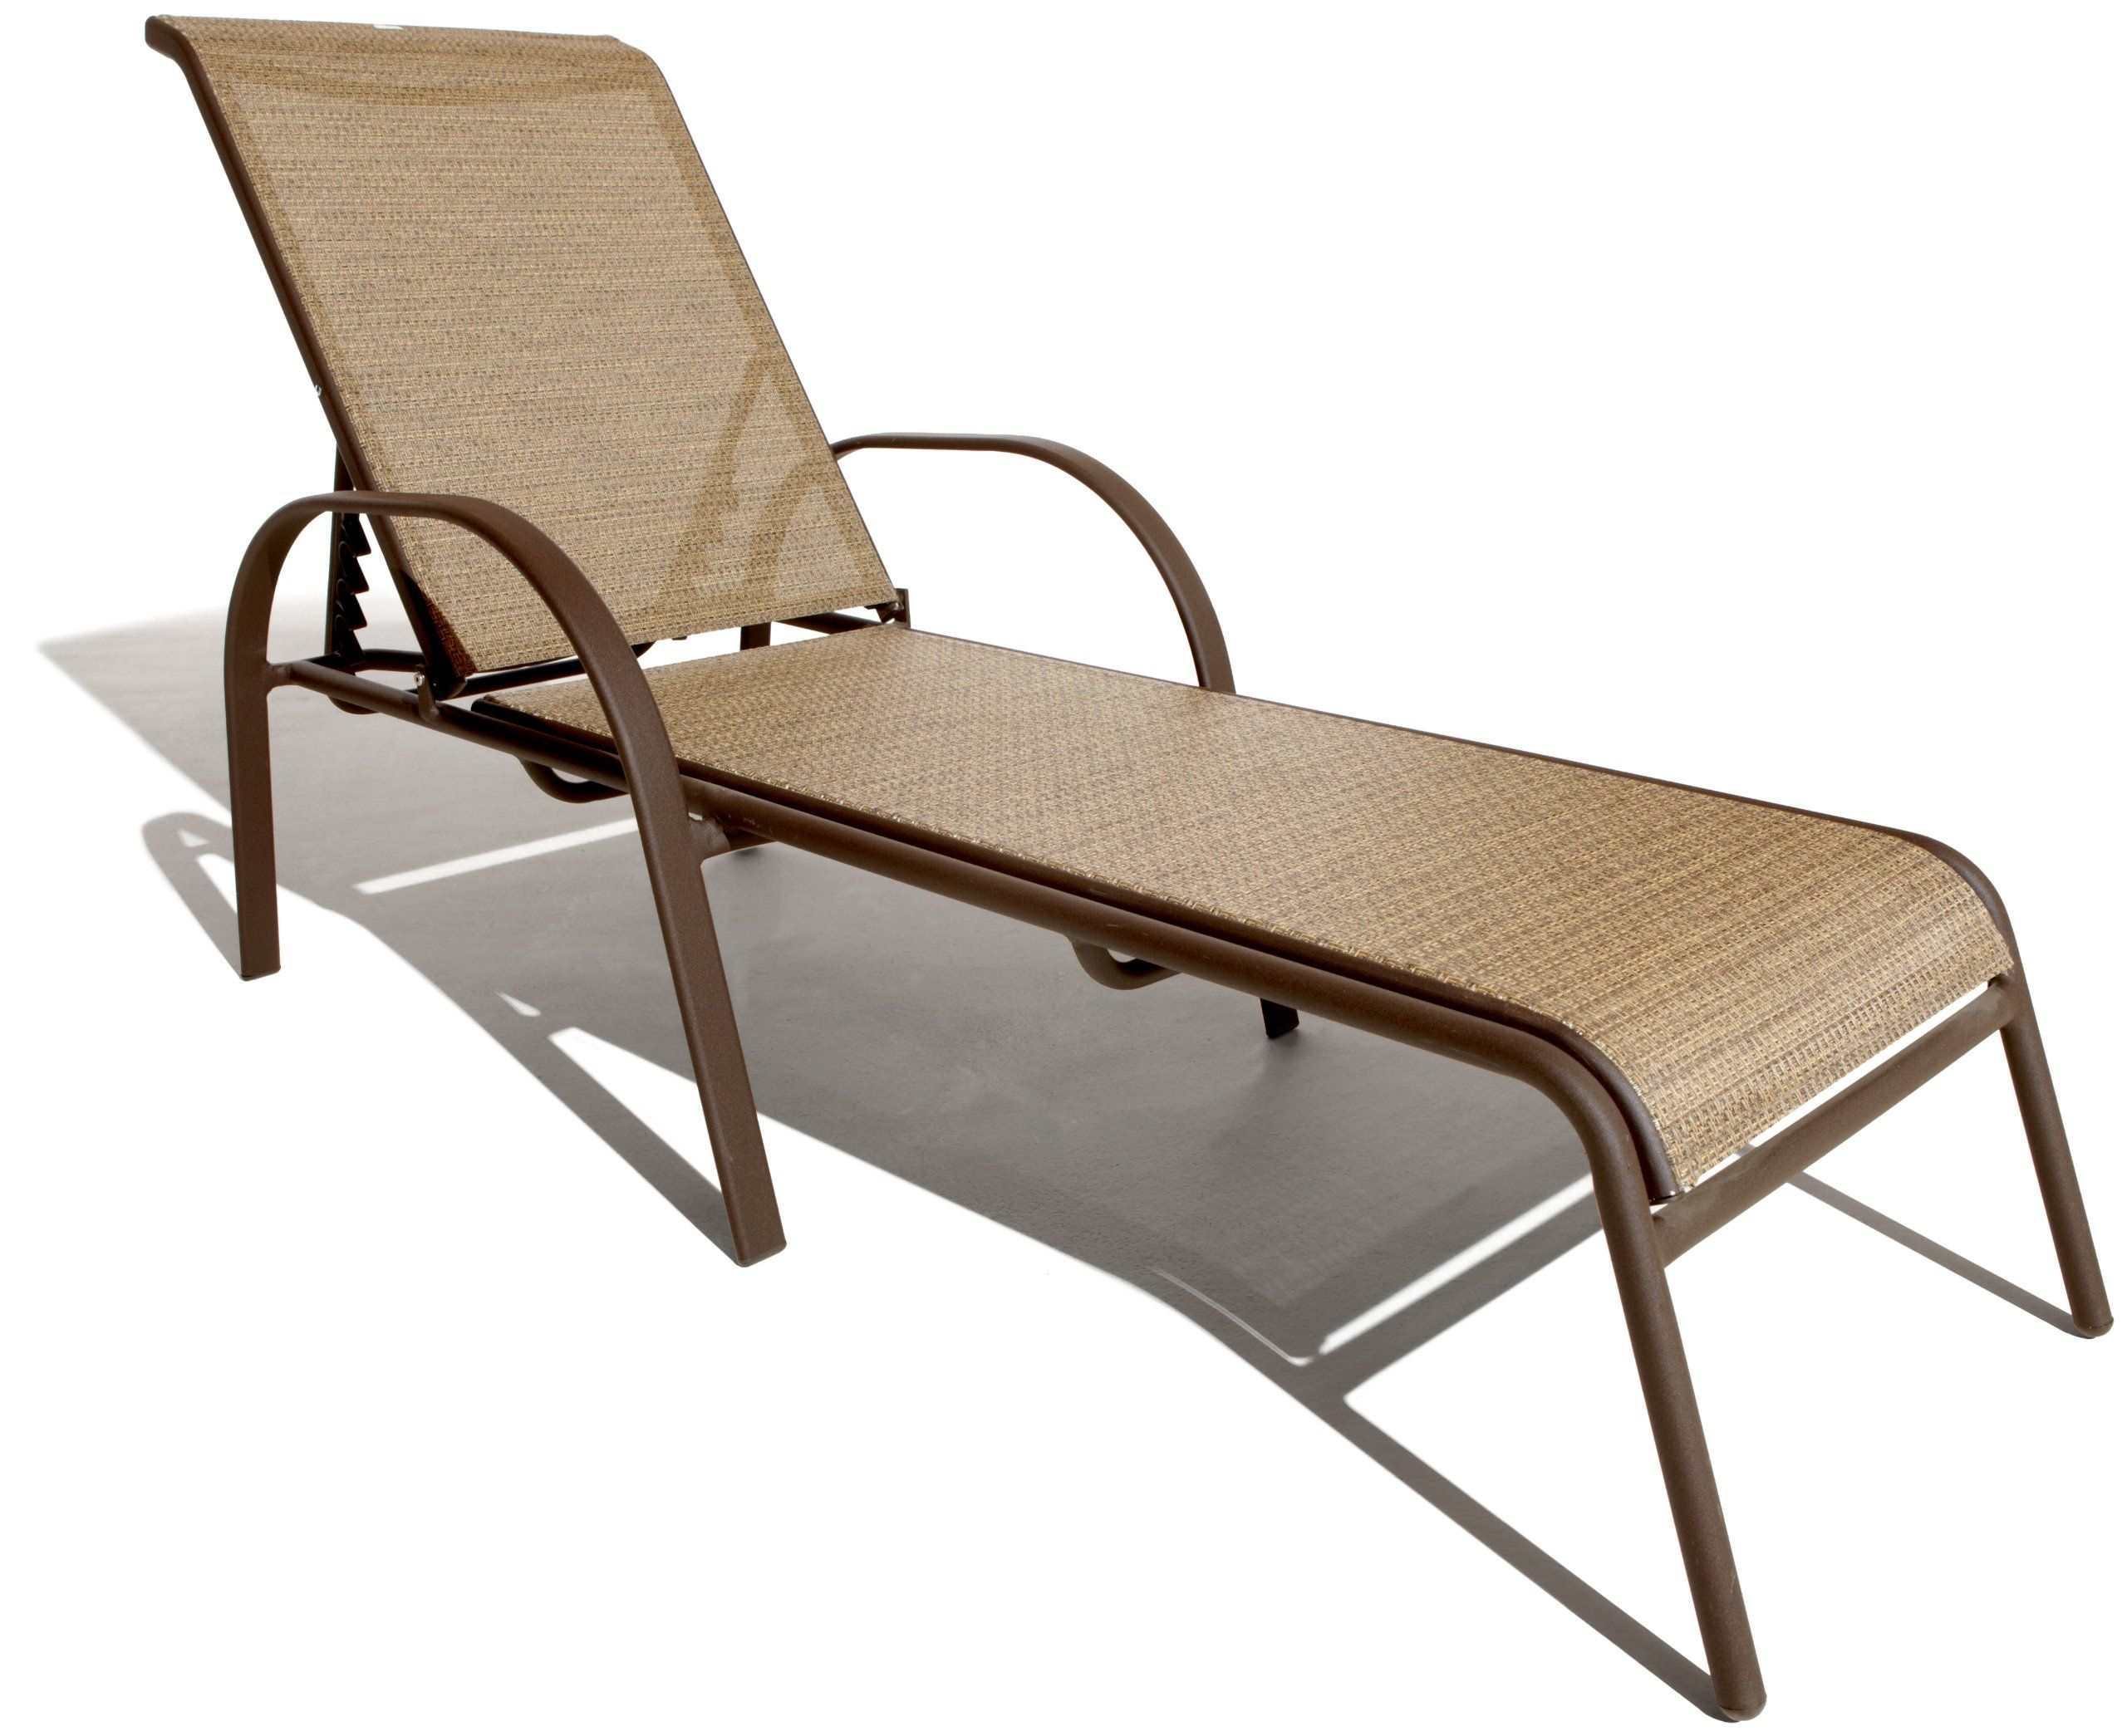 Amazon.com : Strathwood Rawley Textilene Chaise Lounge Chair 2 Pk : Patio,  Lawn